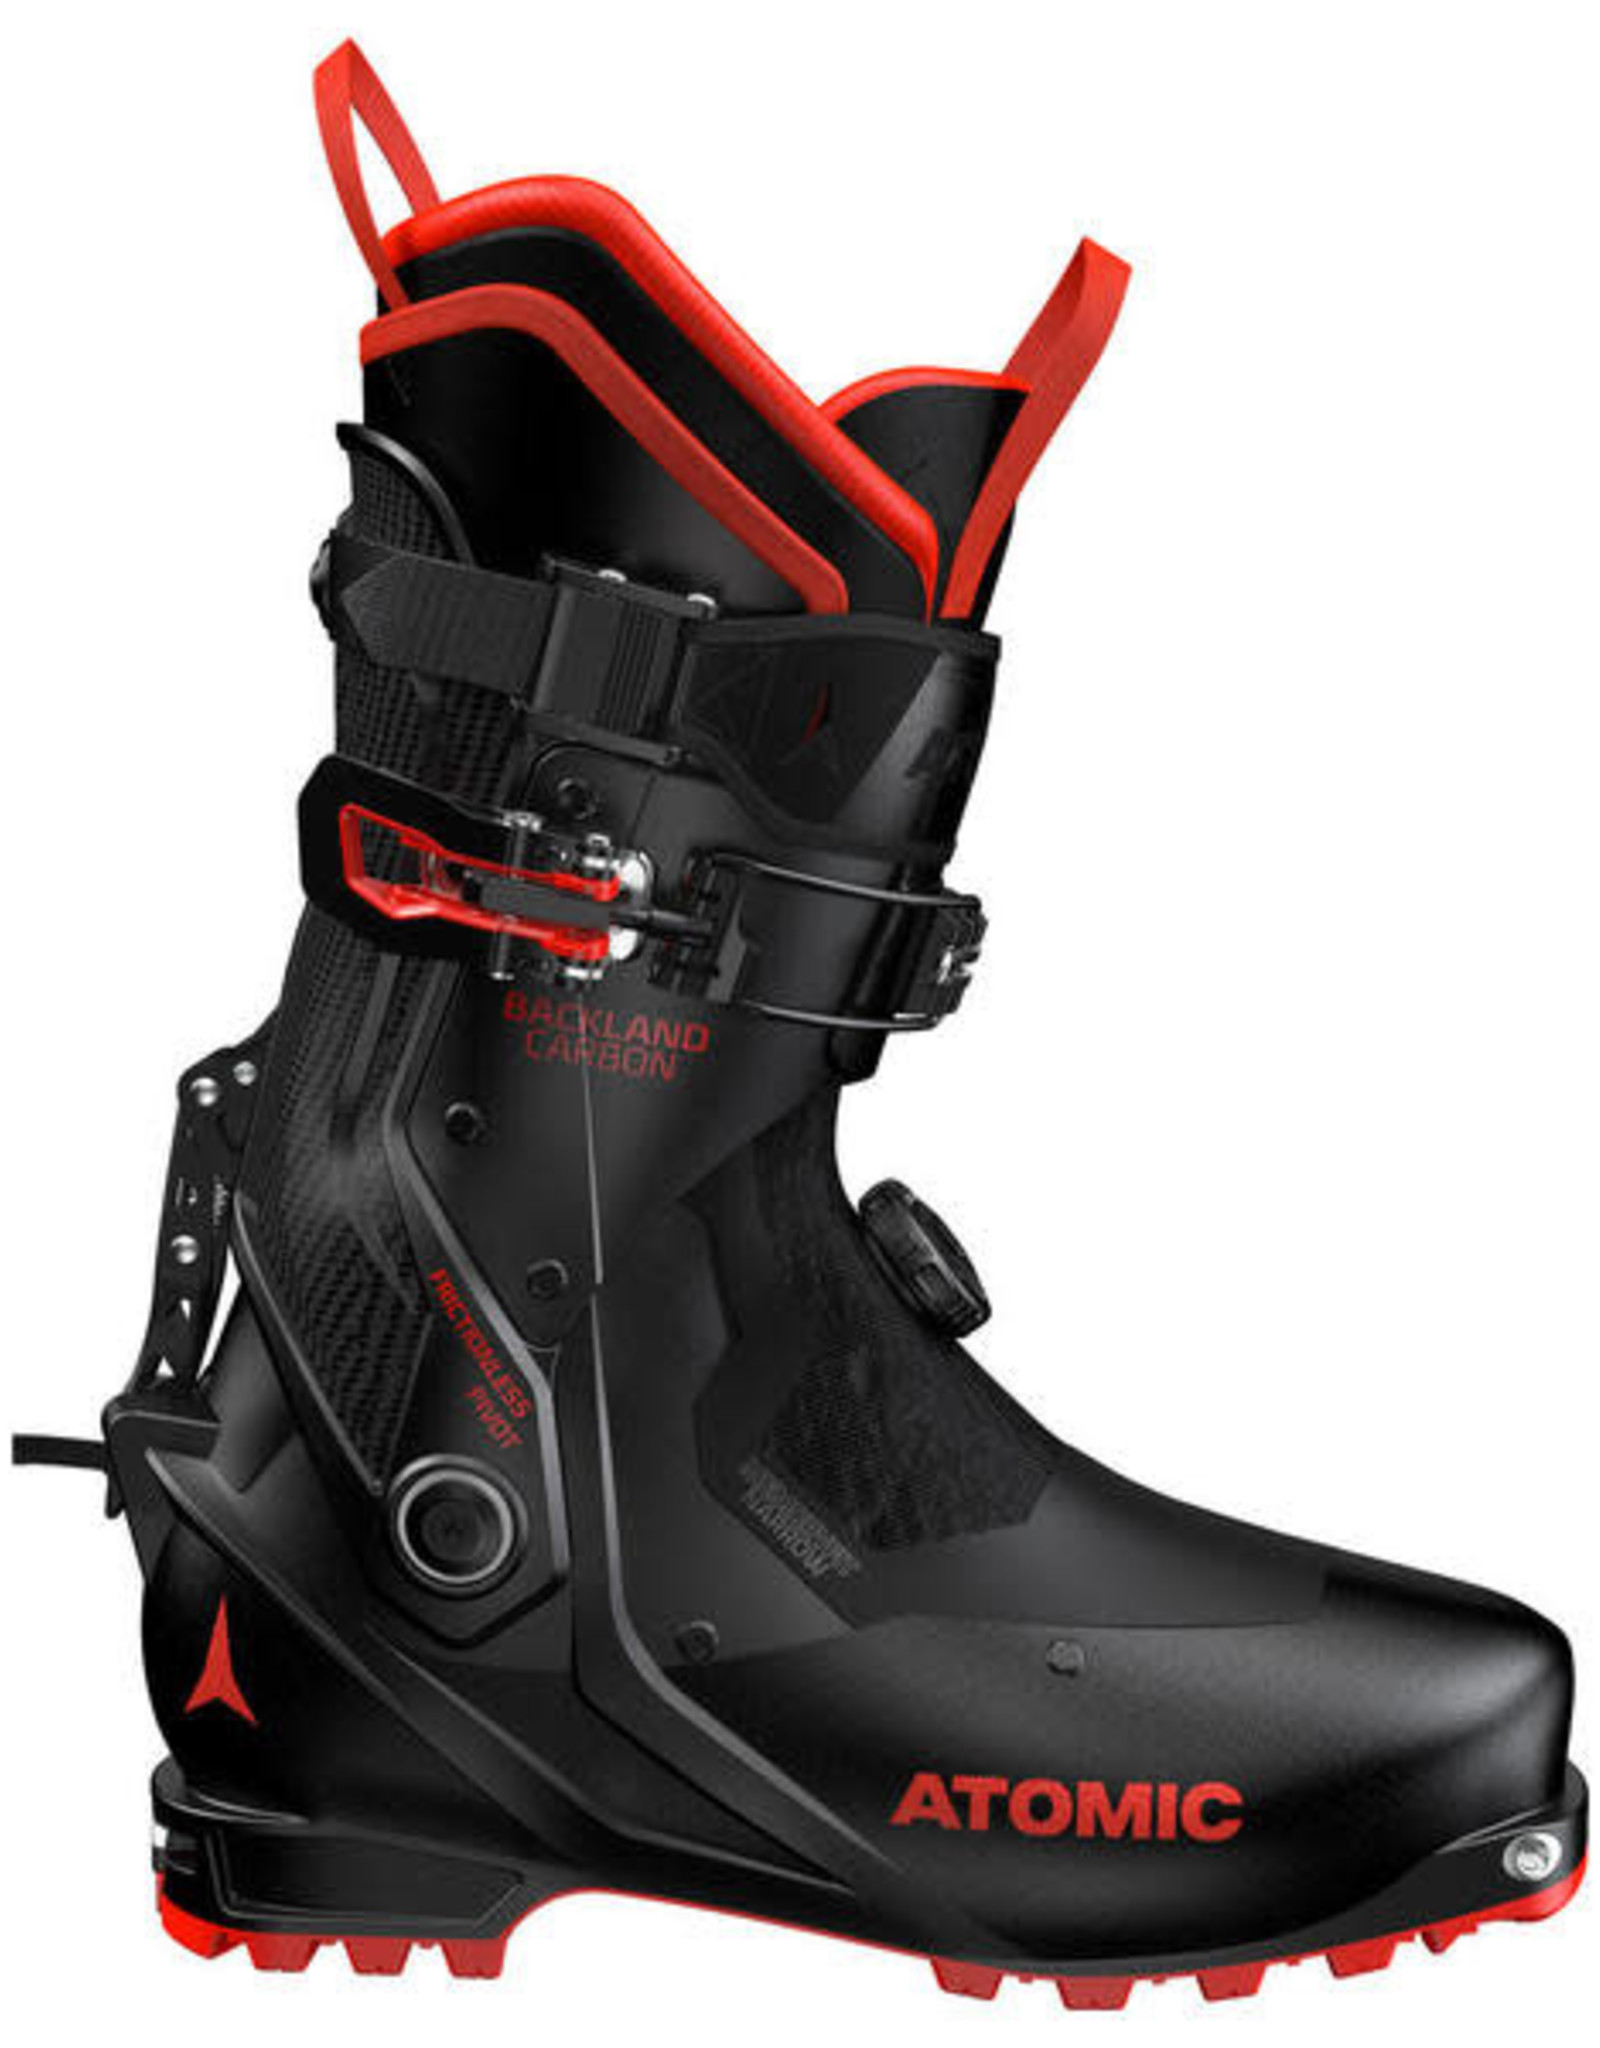 Atomic BACKLAND CARBON 2021